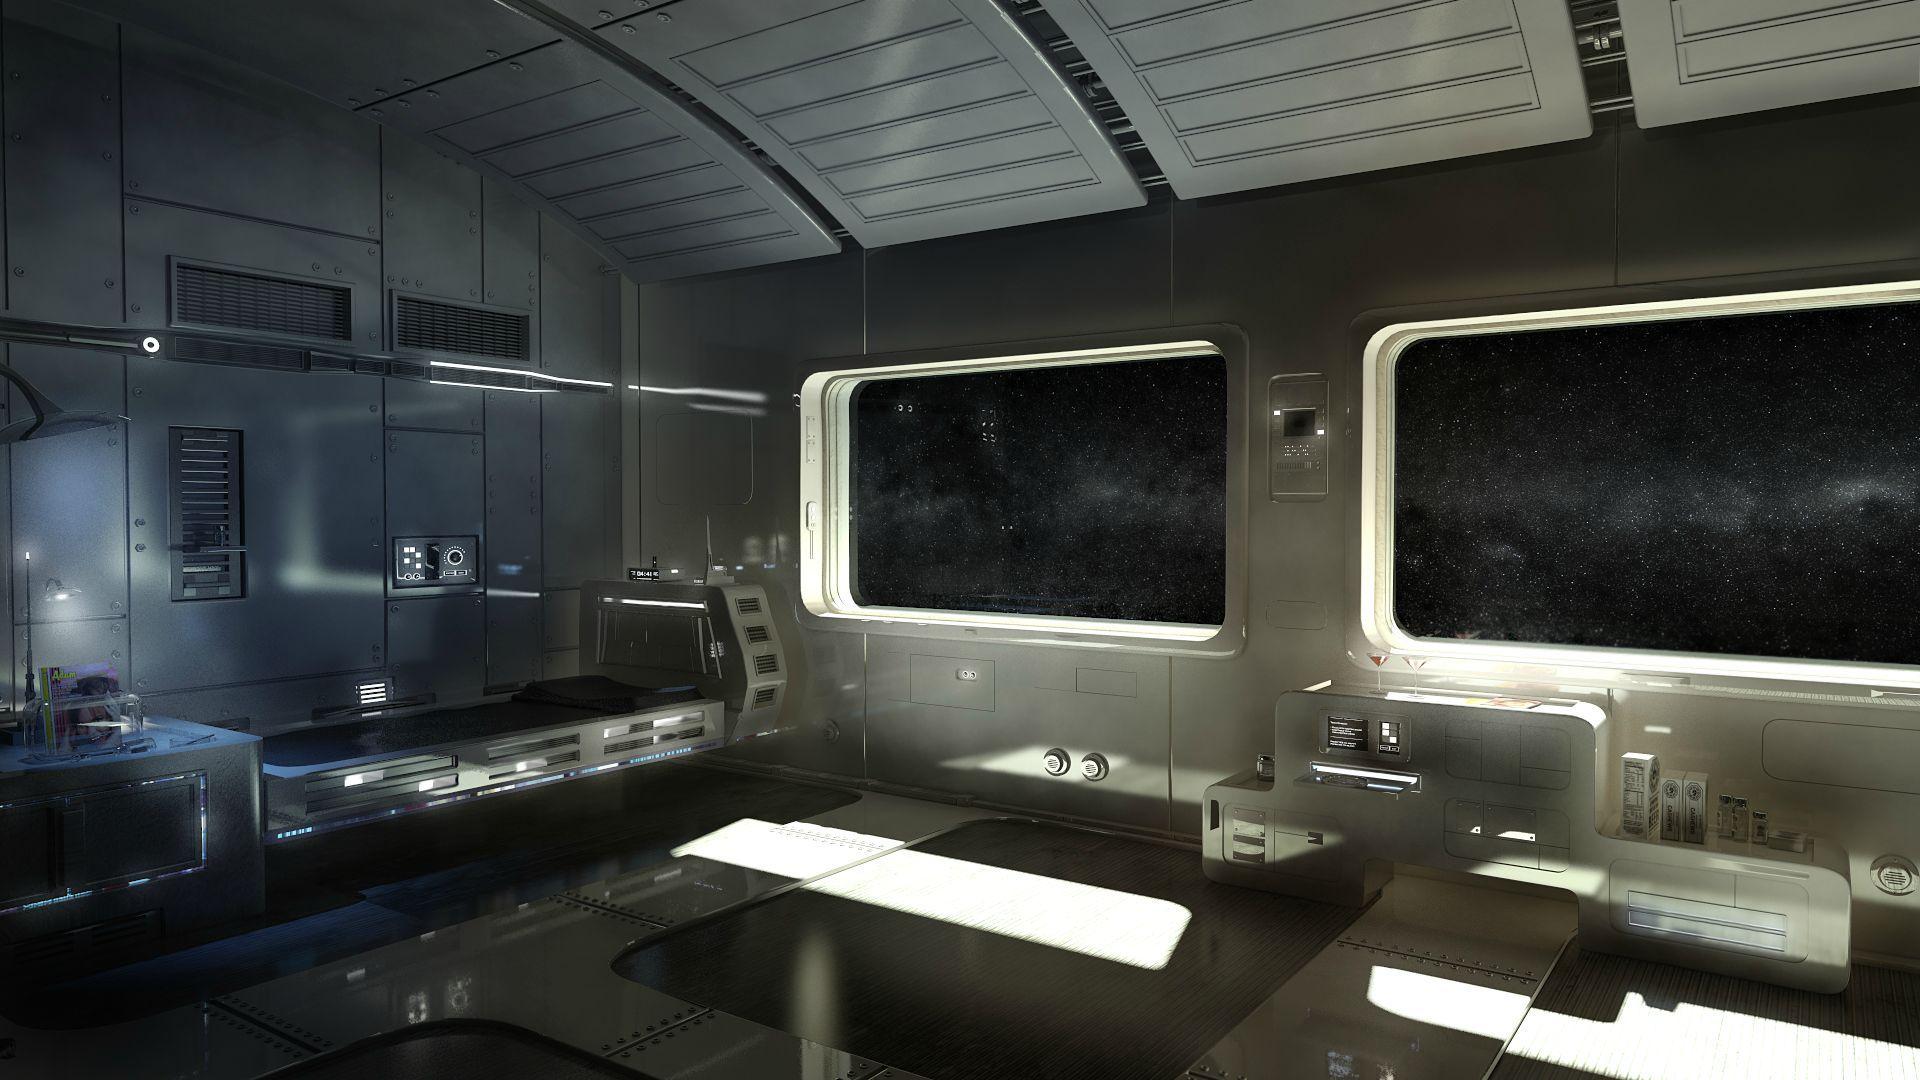 Futuristic Spaceship Bedroom Wonderful 2 On Future Spaceship Interior  Wallpaper